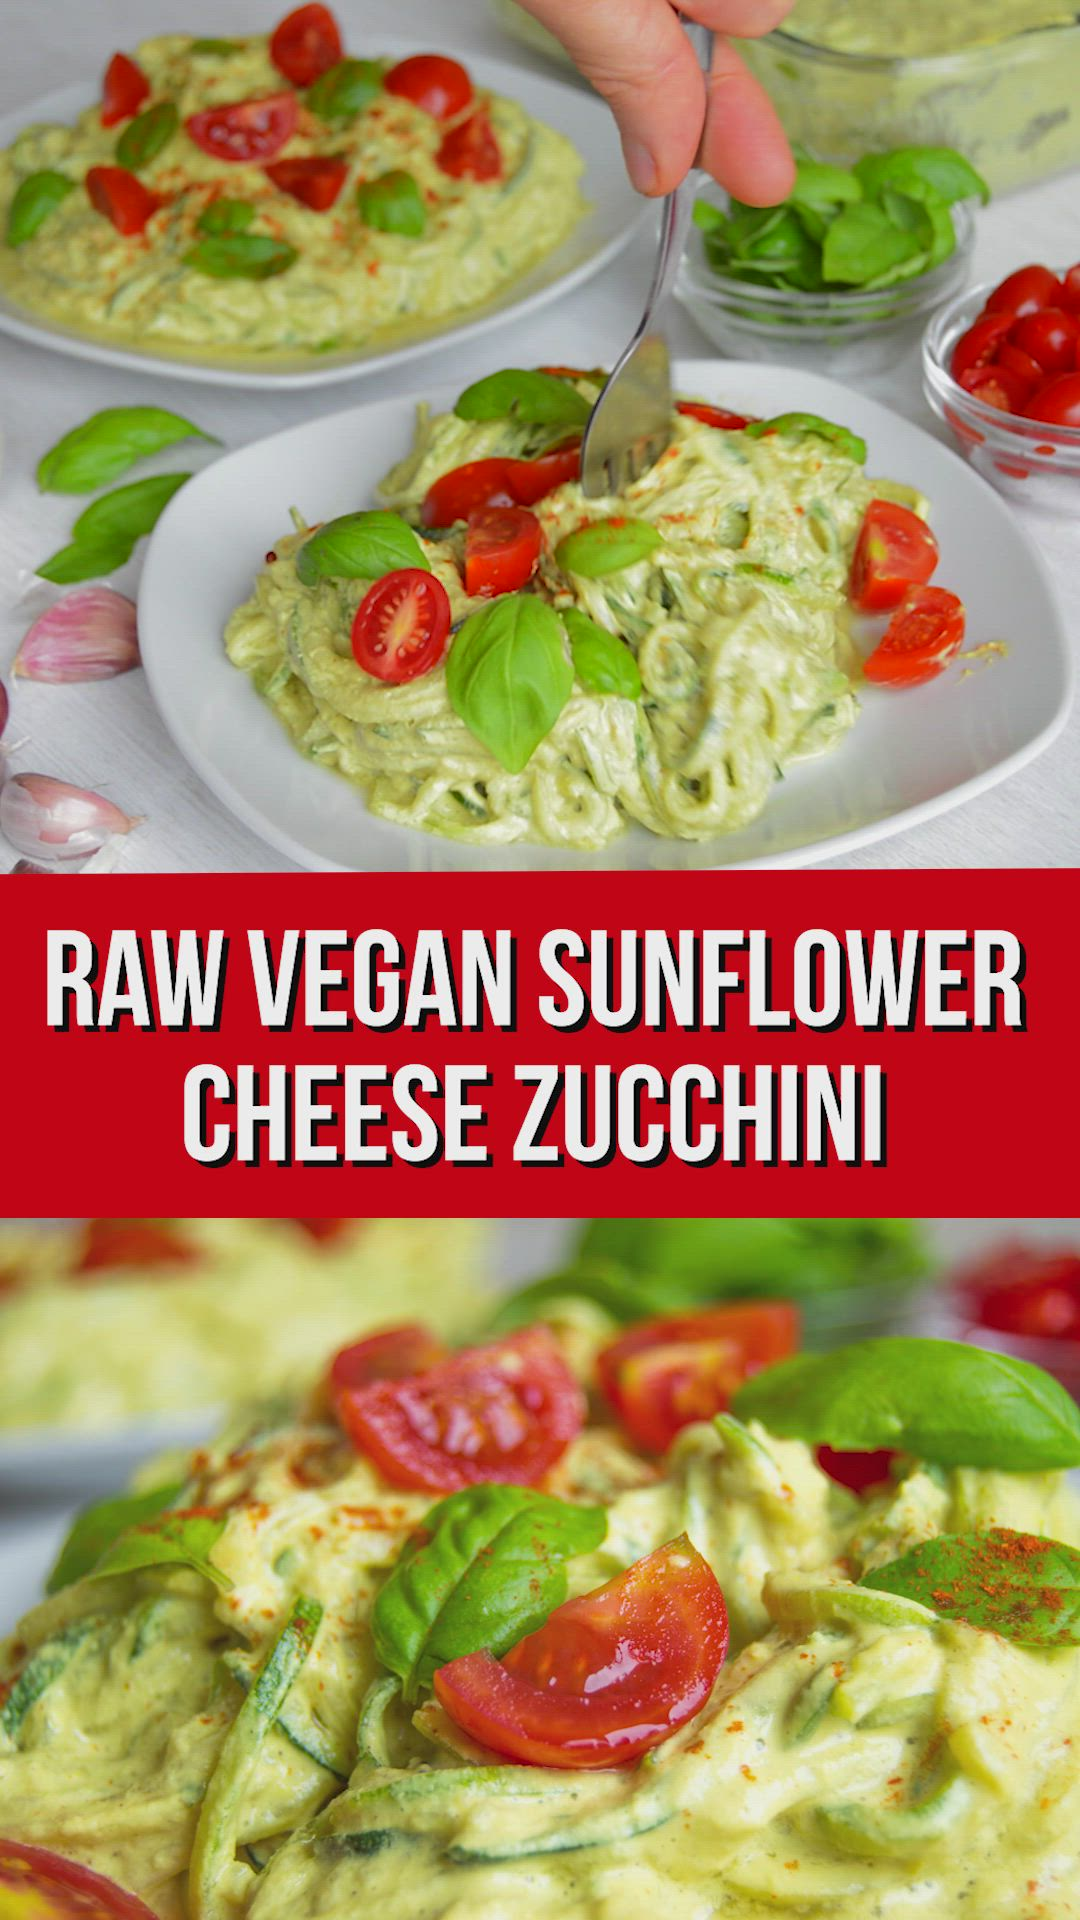 Sunflower Cheese Raw Courgetti Video Recipe Video Raw Food Diet Raw Vegan Recipes Raw Food Recipes